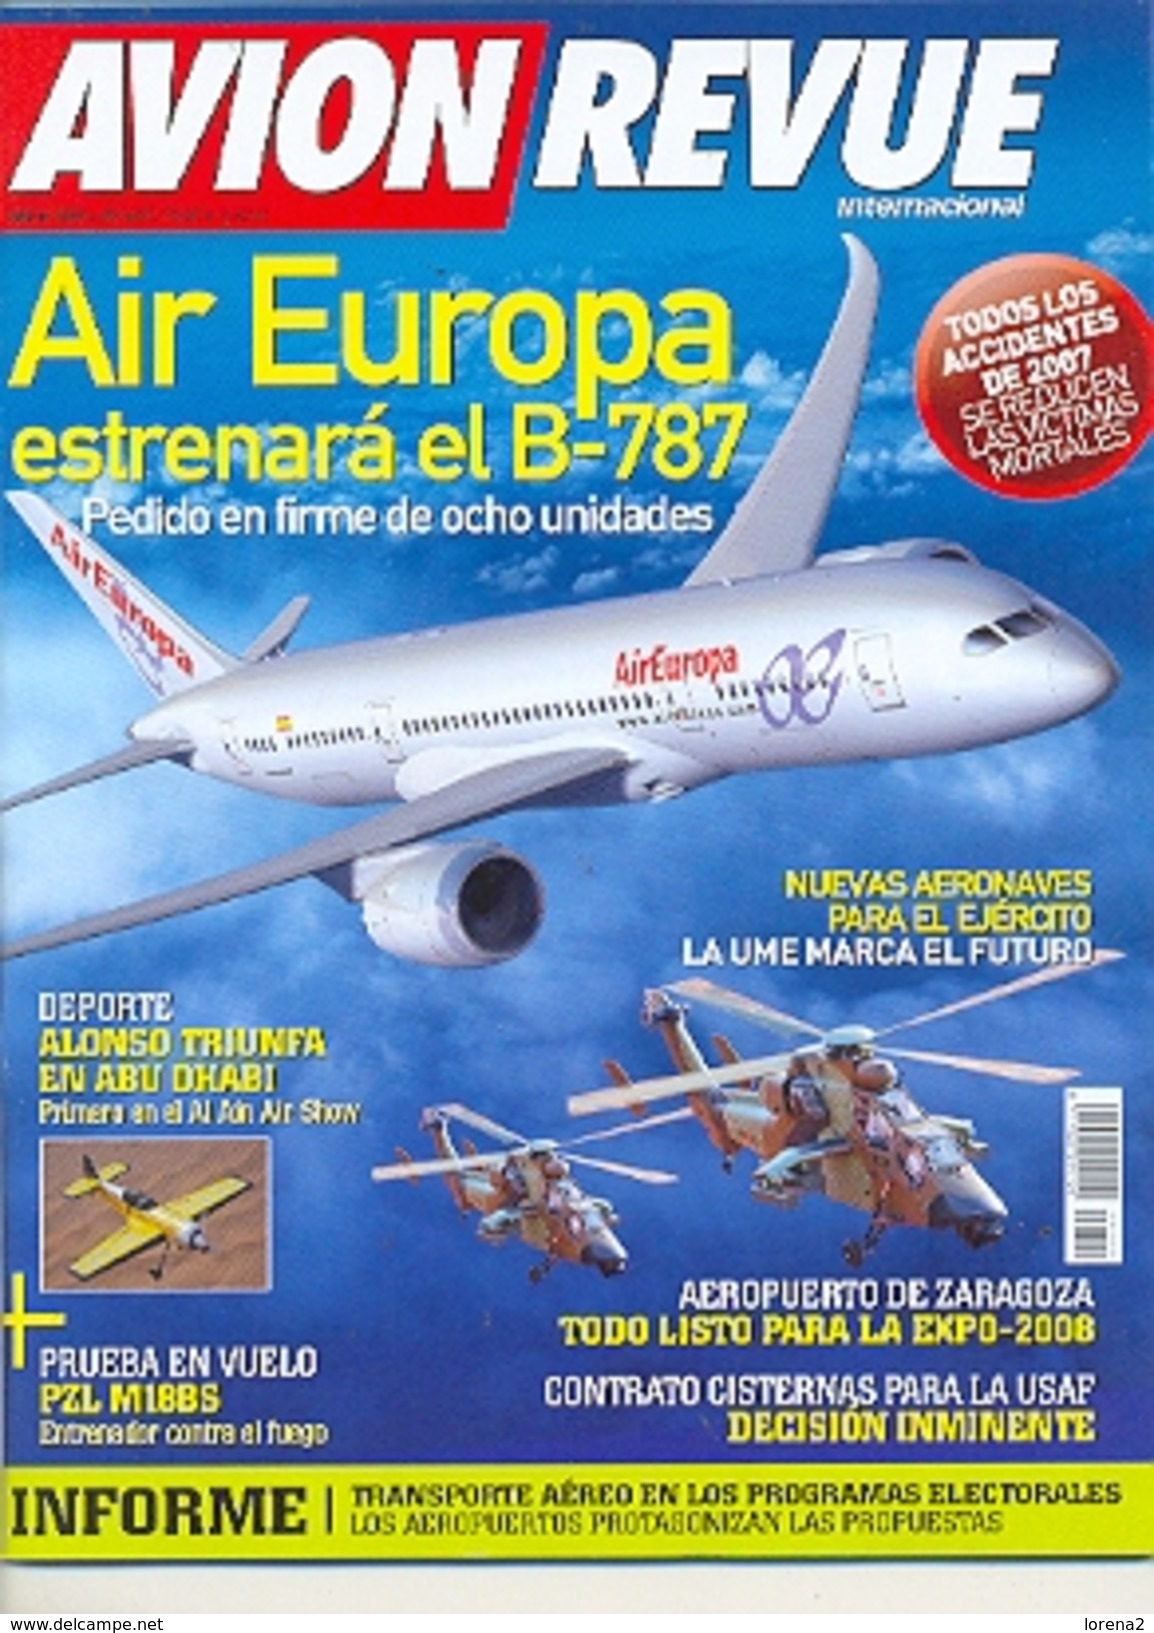 Revista Avion Revue Internacional. Nº 309. (ref.avirev-309) - Aviación